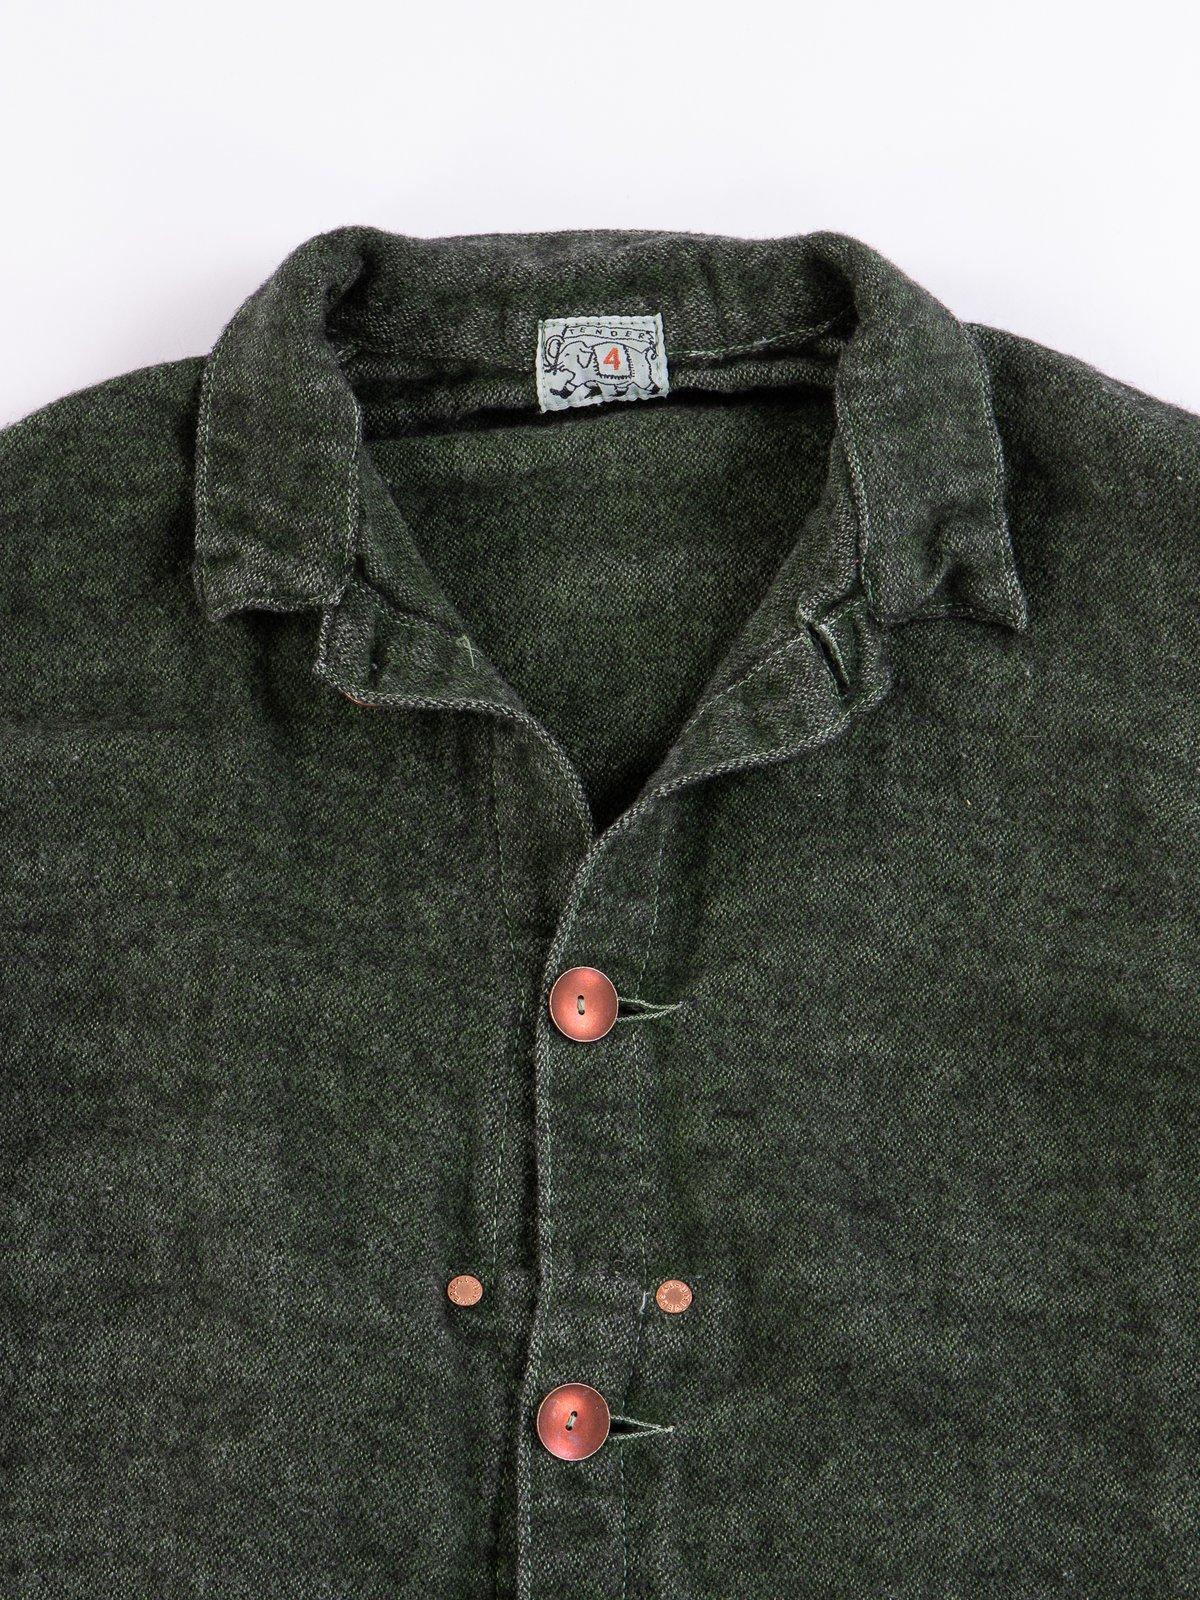 Viridian/Black Cotton/Mohair Janus Jacket - Image 2